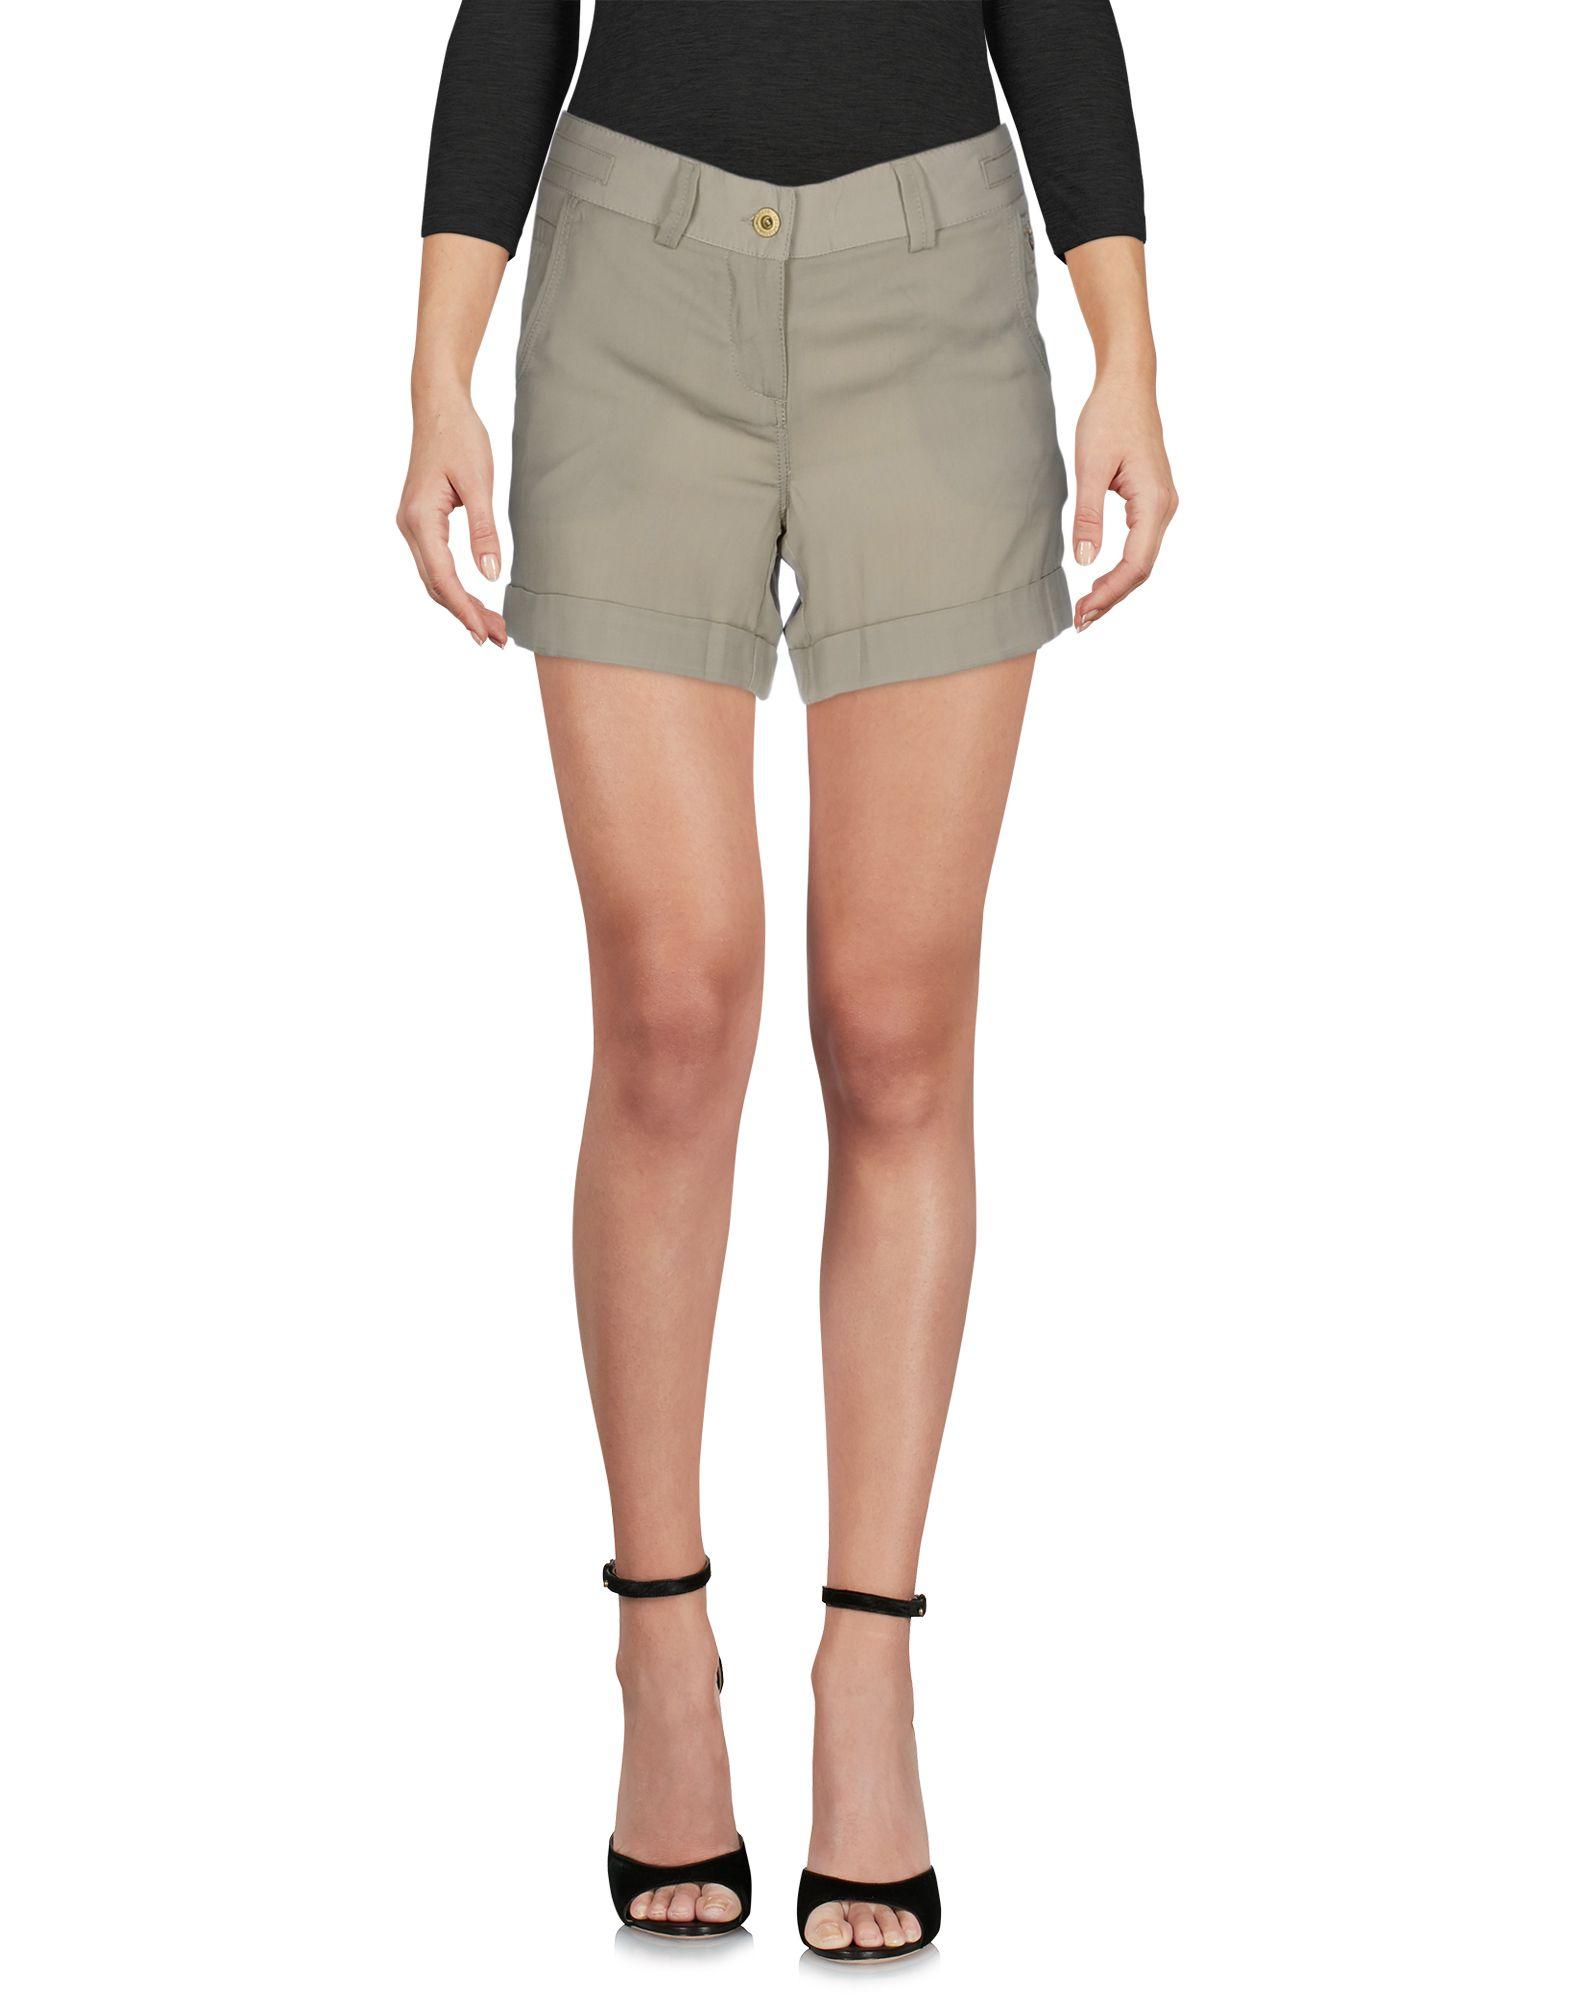 Shorts Shorts & Bermuda Aeronautica Militare donna - 13041989RQ  Rabatte kaufen